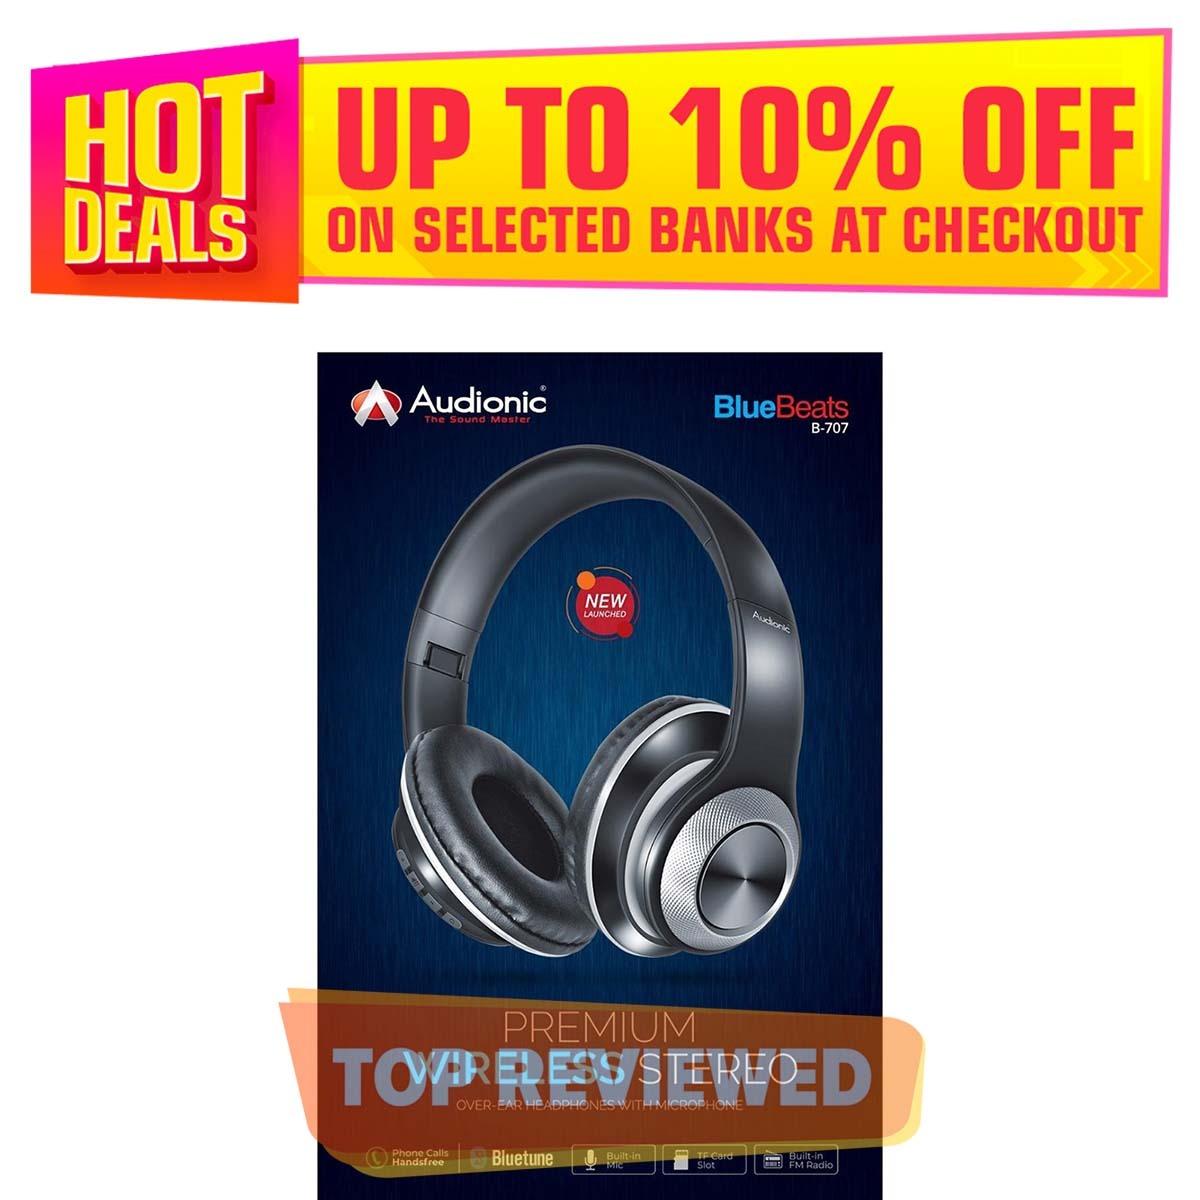 Audionic - Premium Wireless Stereo - HEADPHONE With Microphone (B-707)